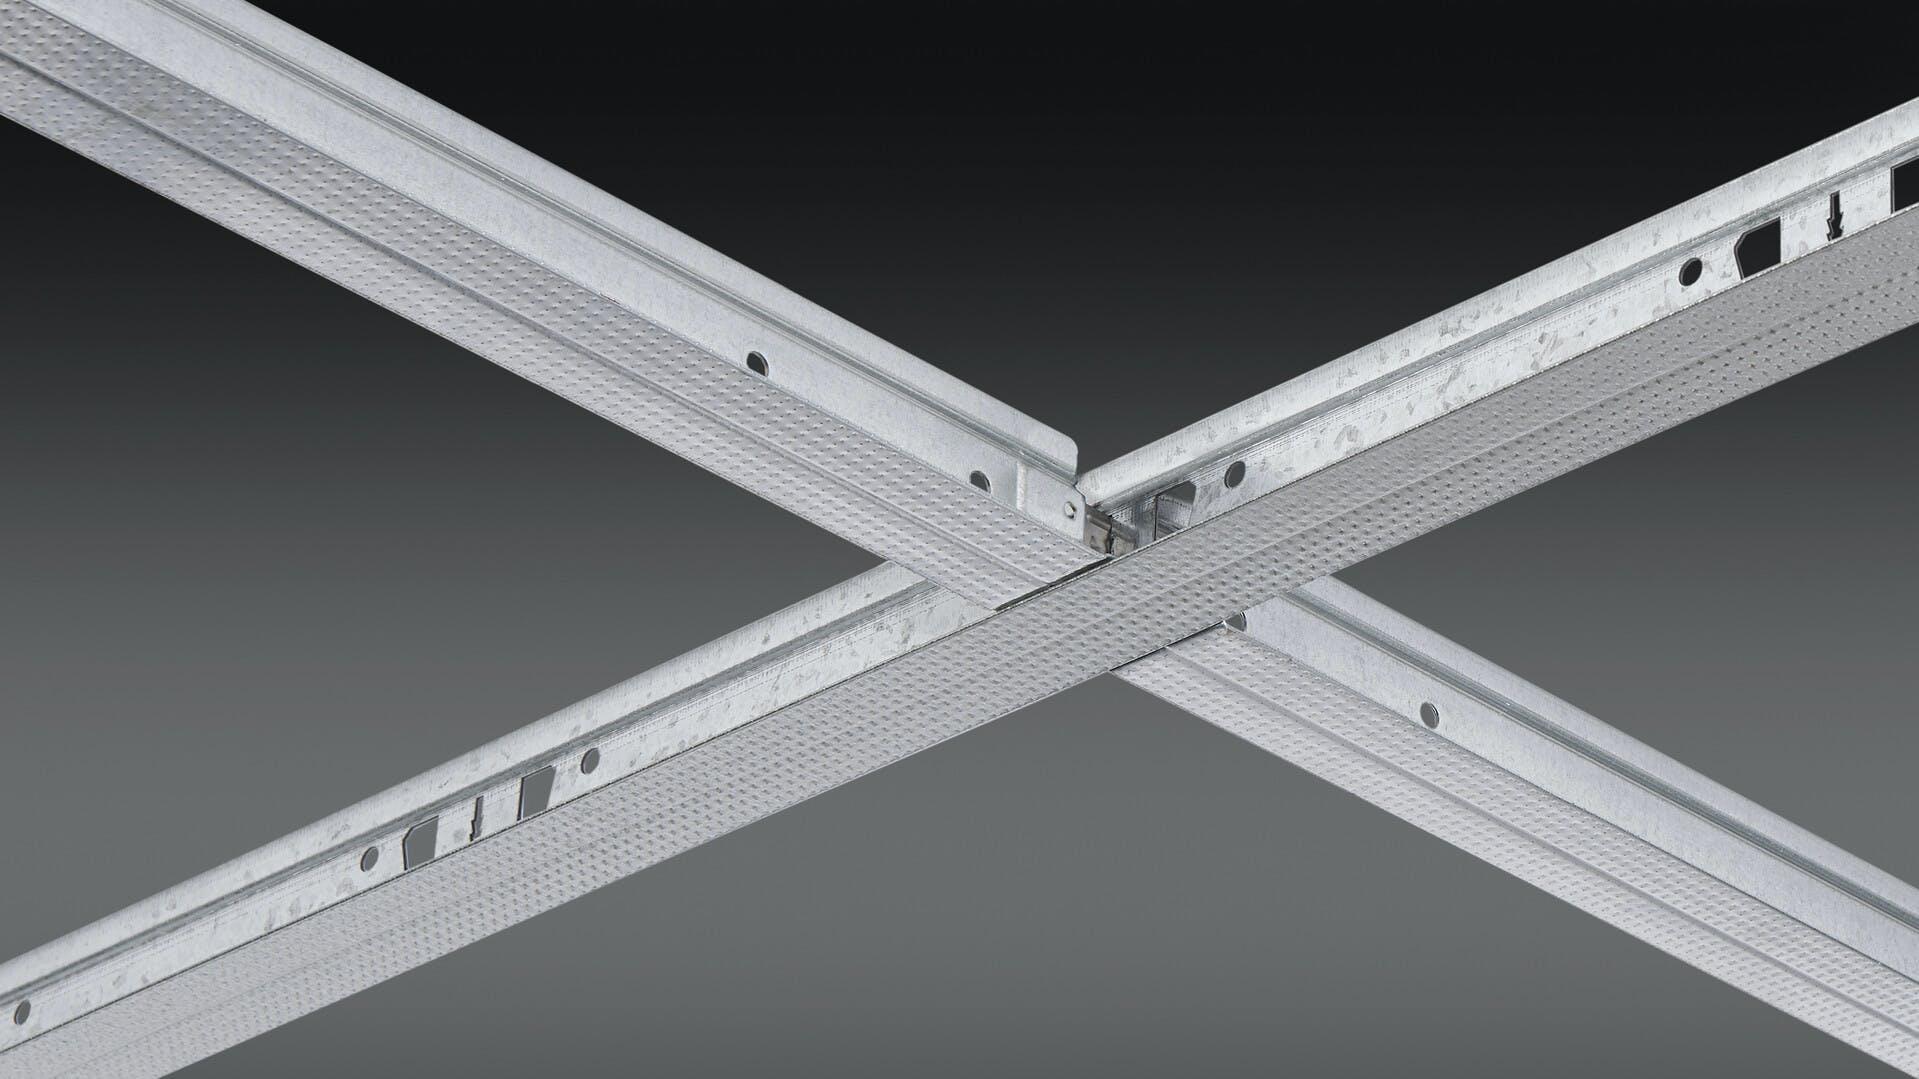 IMG_Rockfon_Chicago Metallic 640 Drywall Grid